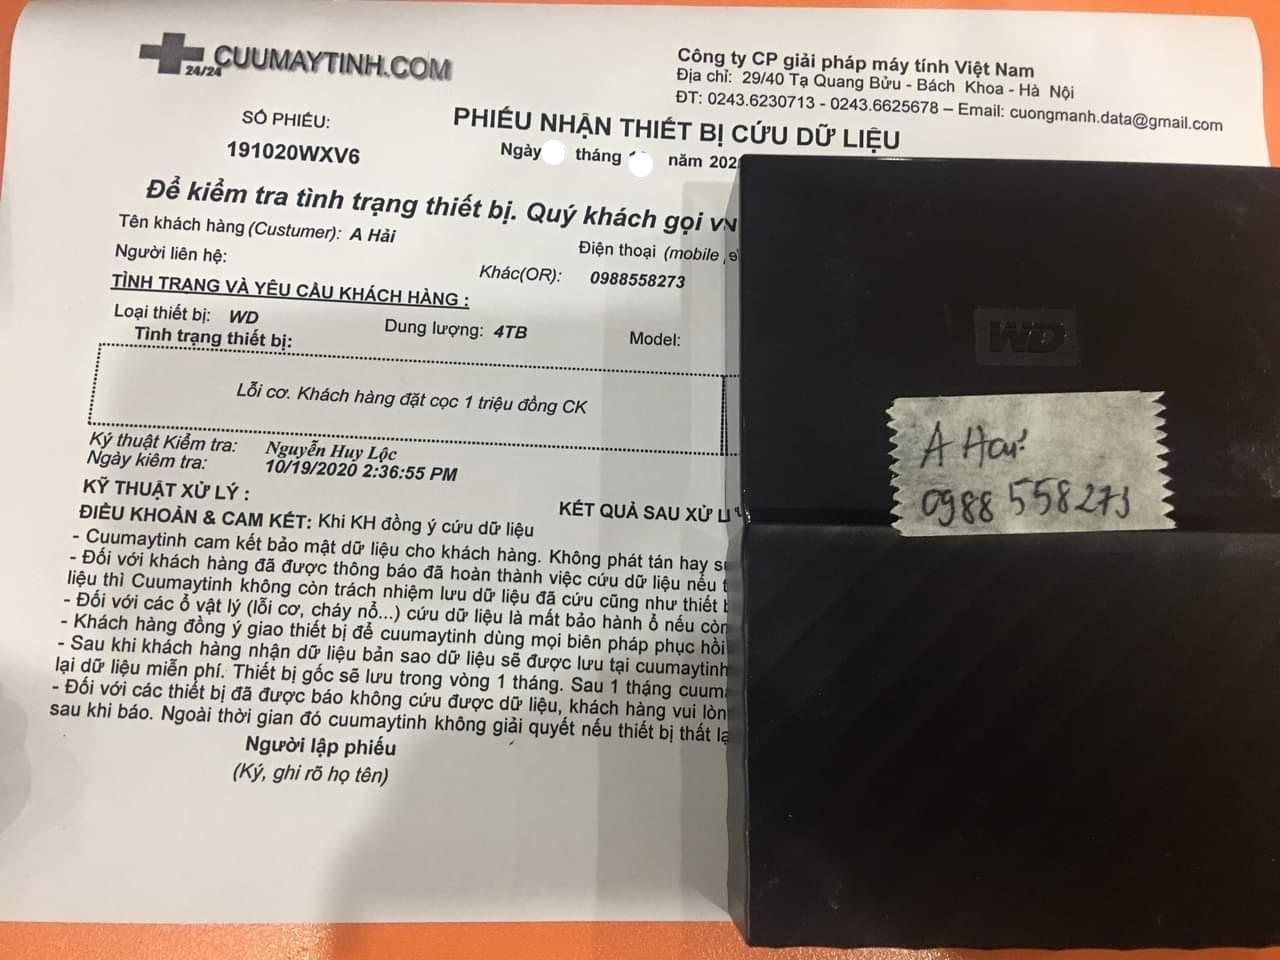 Phục hồi dữ liệu ổ cứng Western 4TB lỗi cơ 05/11 - cuumaytinh